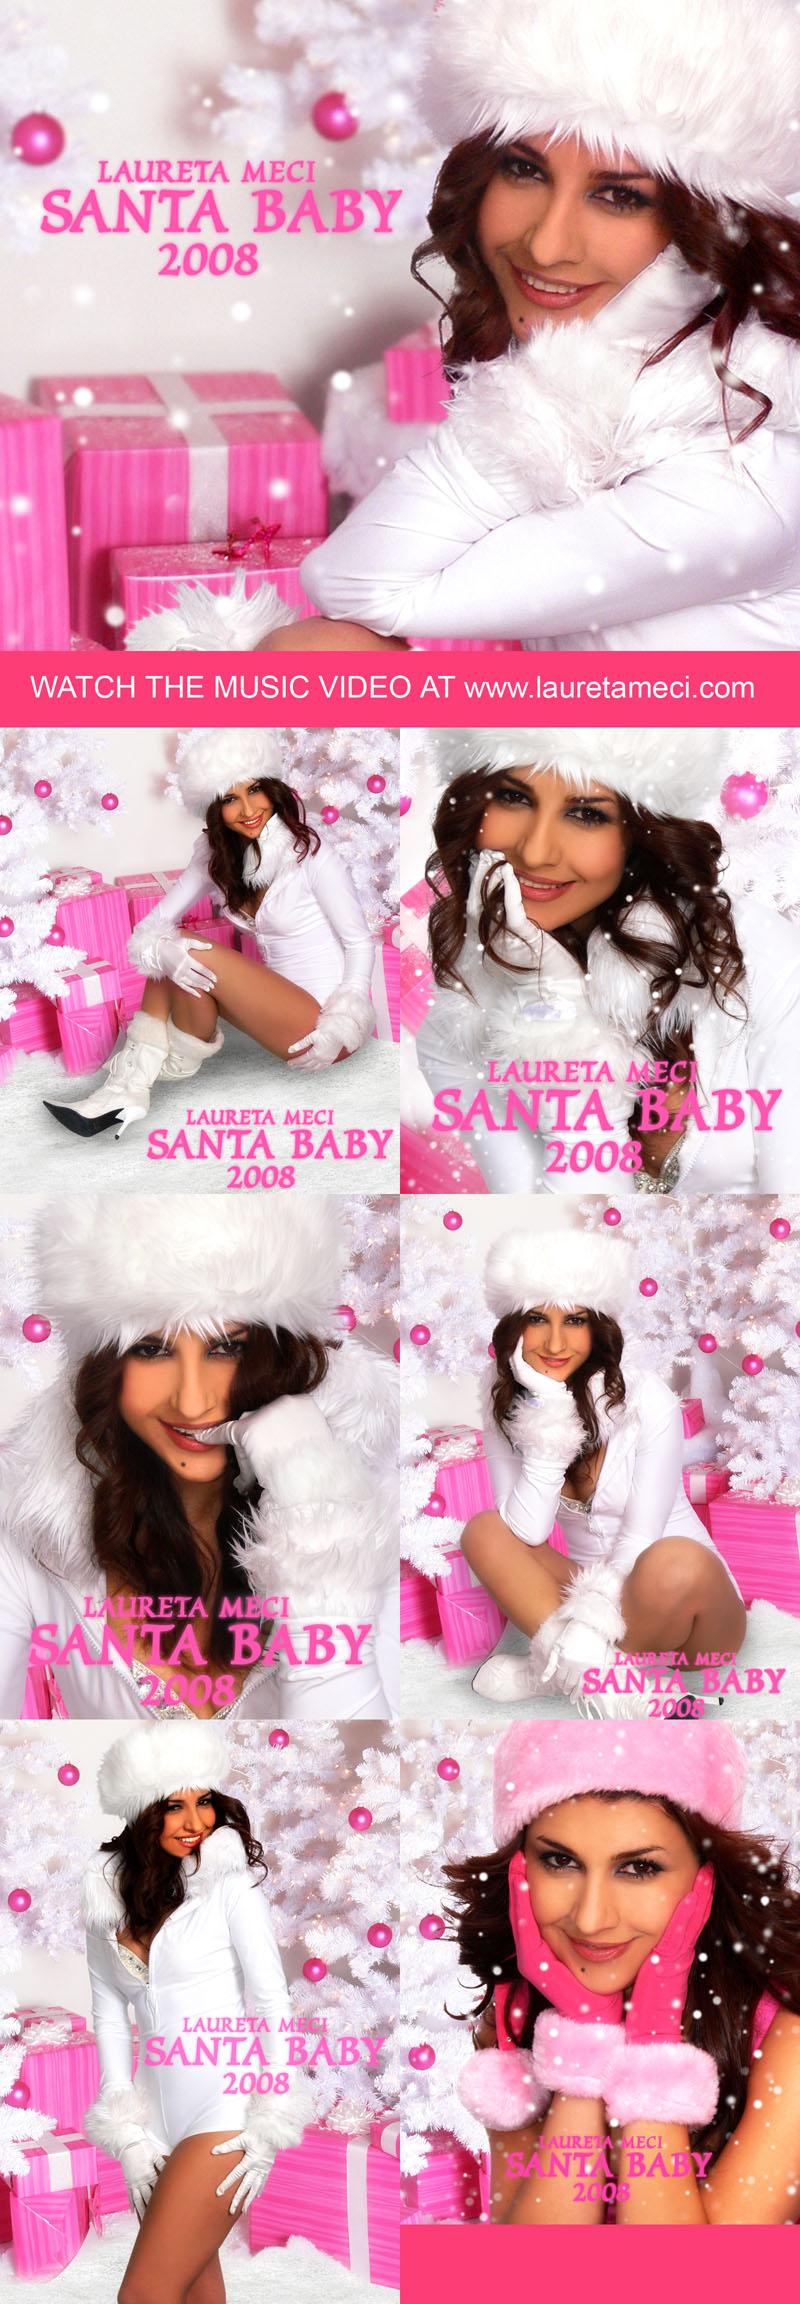 Winter Wonderland Dec 20, 2008 2008 John Bailey and Laureta Meci Music Video PLEASE SEE AT **** www.lauretameci.com *****  Promo Pics - Laureta Meci - Santa Baby 2008